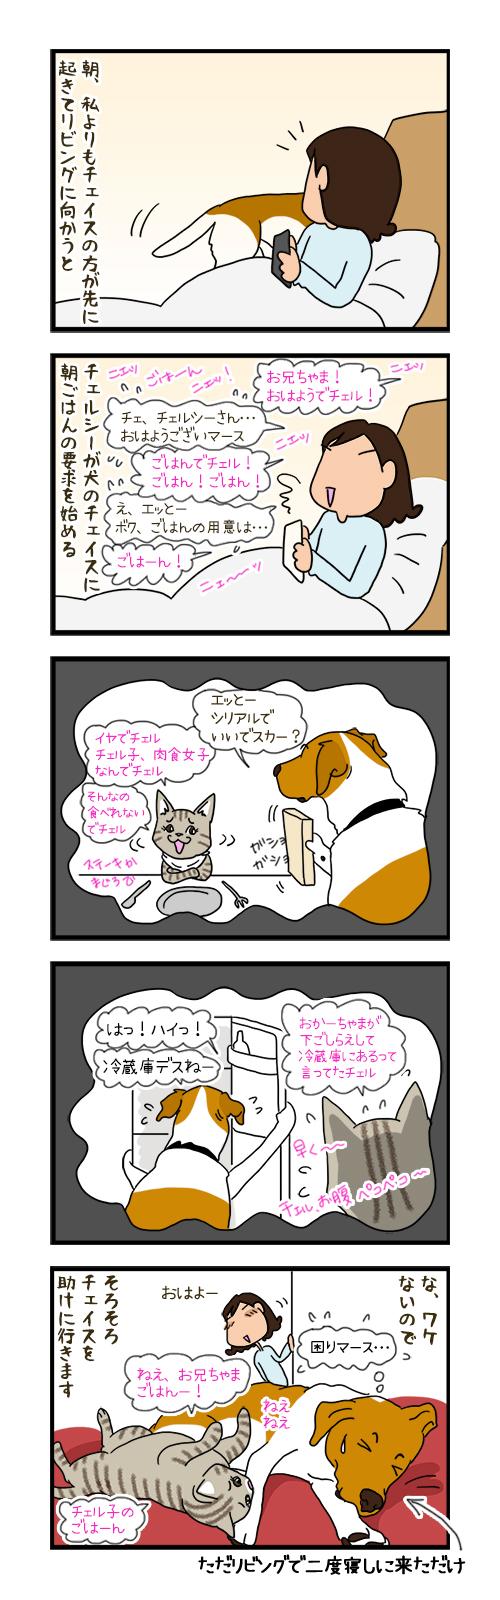 26032020_dogcomicB.jpg